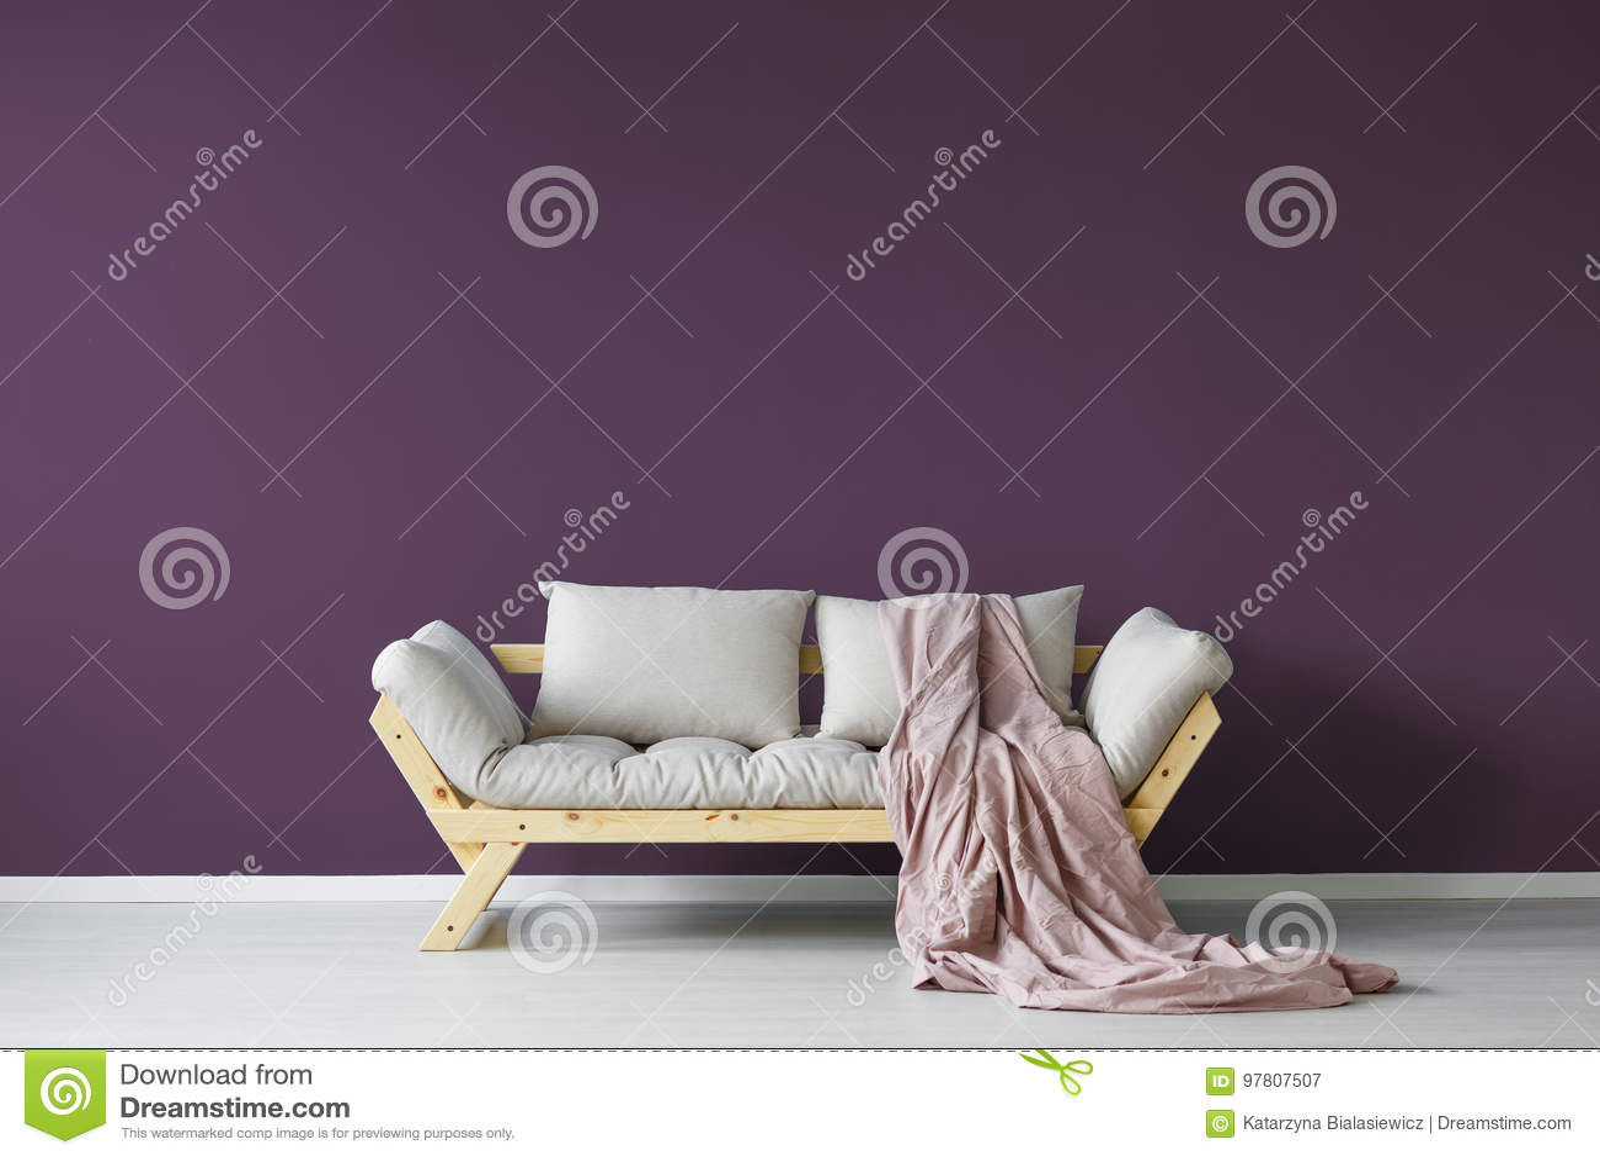 Фиолетовый интерьер комнаты дня